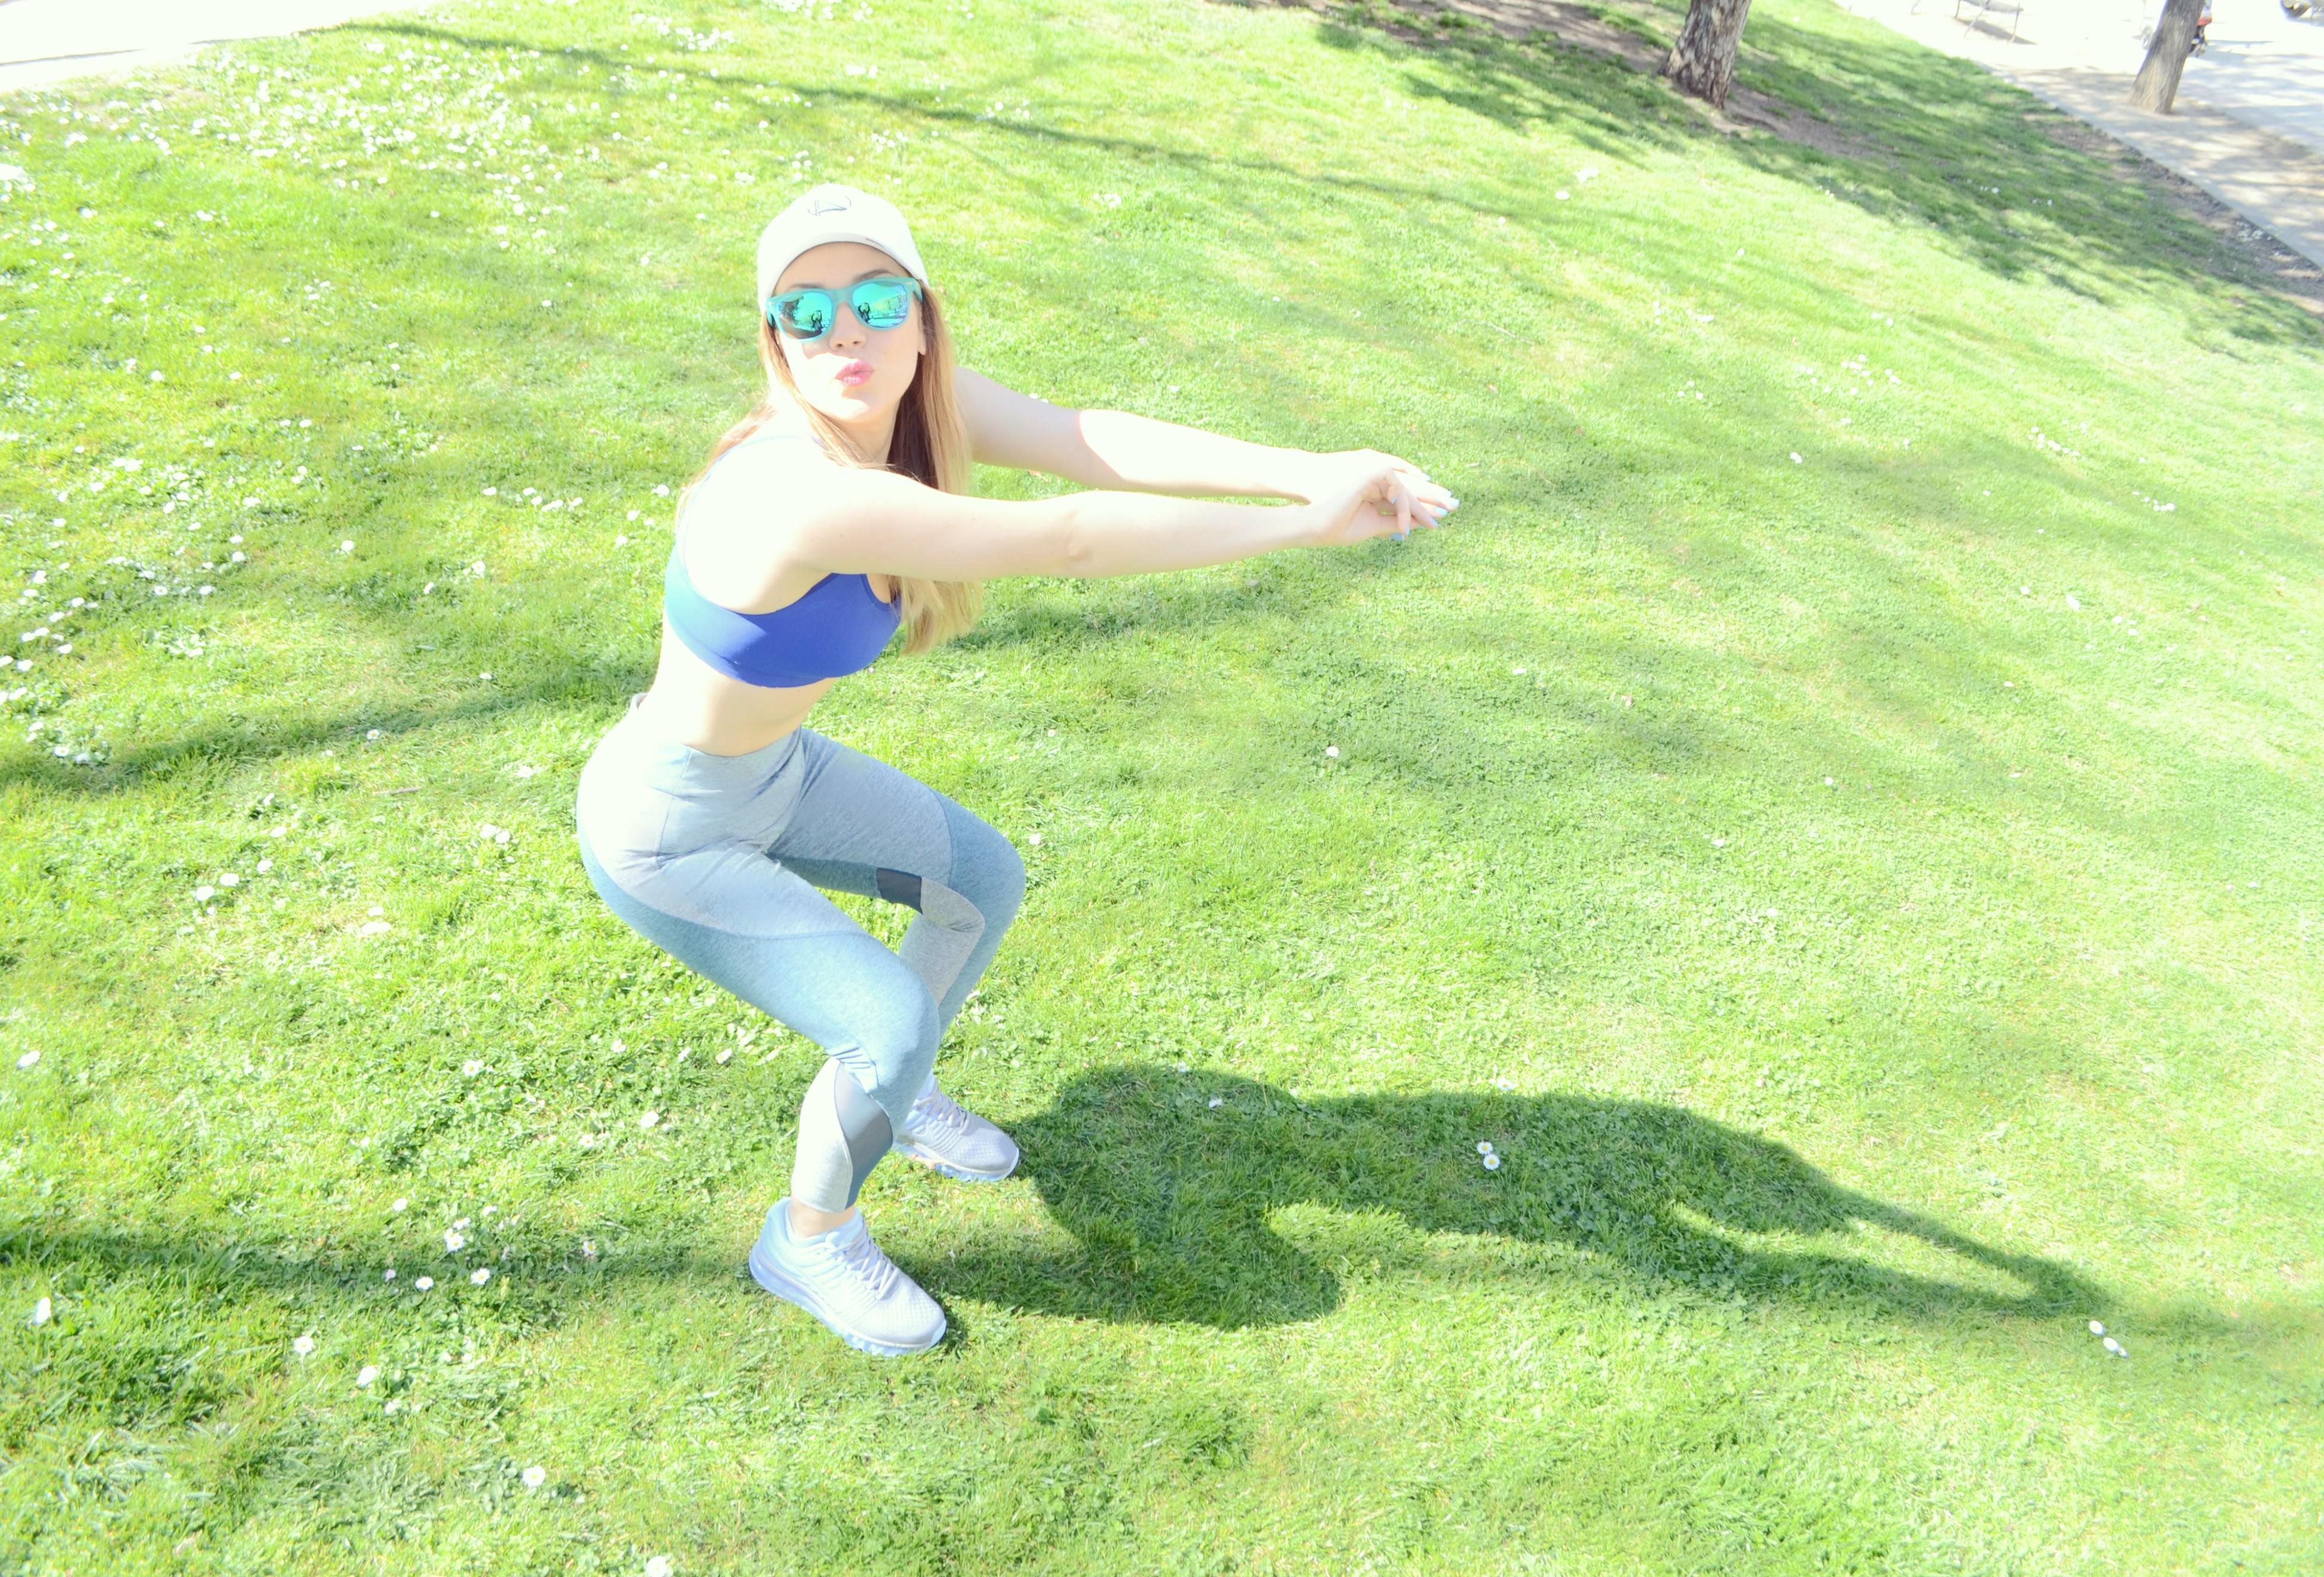 ChicAdicta-Nike-Air-Max-2017-blog-de-moda-Chic-Adicta-fashionista-gafas-de-espejo-fitness-style-oysho-deporte-PiensaenChic-Piensa-en-Chic